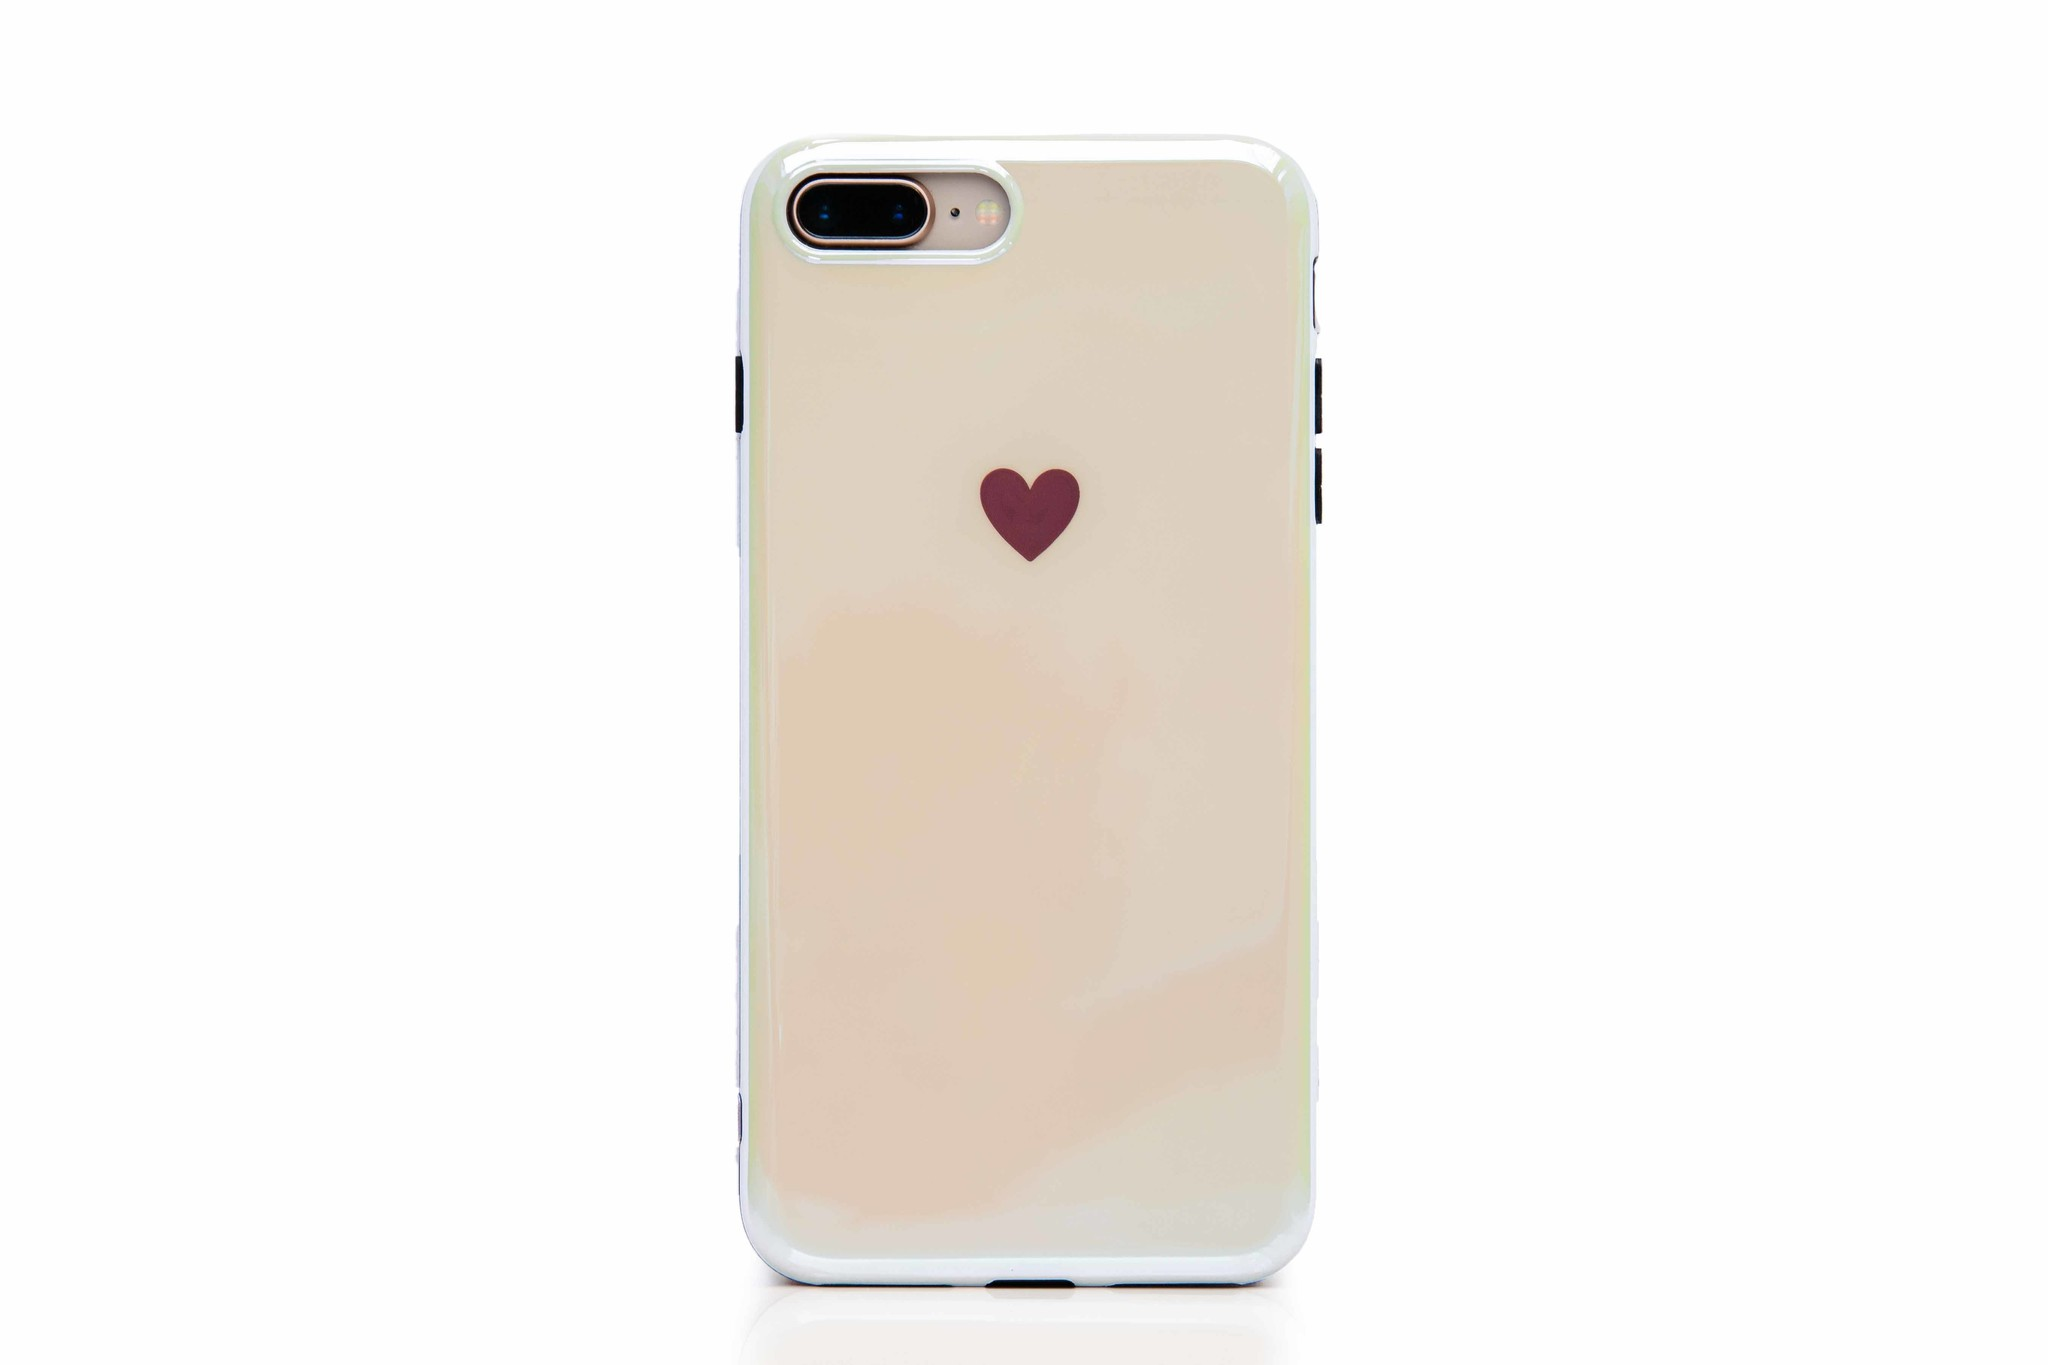 Smartphonehoesje iPhone 7 plus / 8 plus   Effen kleur met hartje   Shiny white